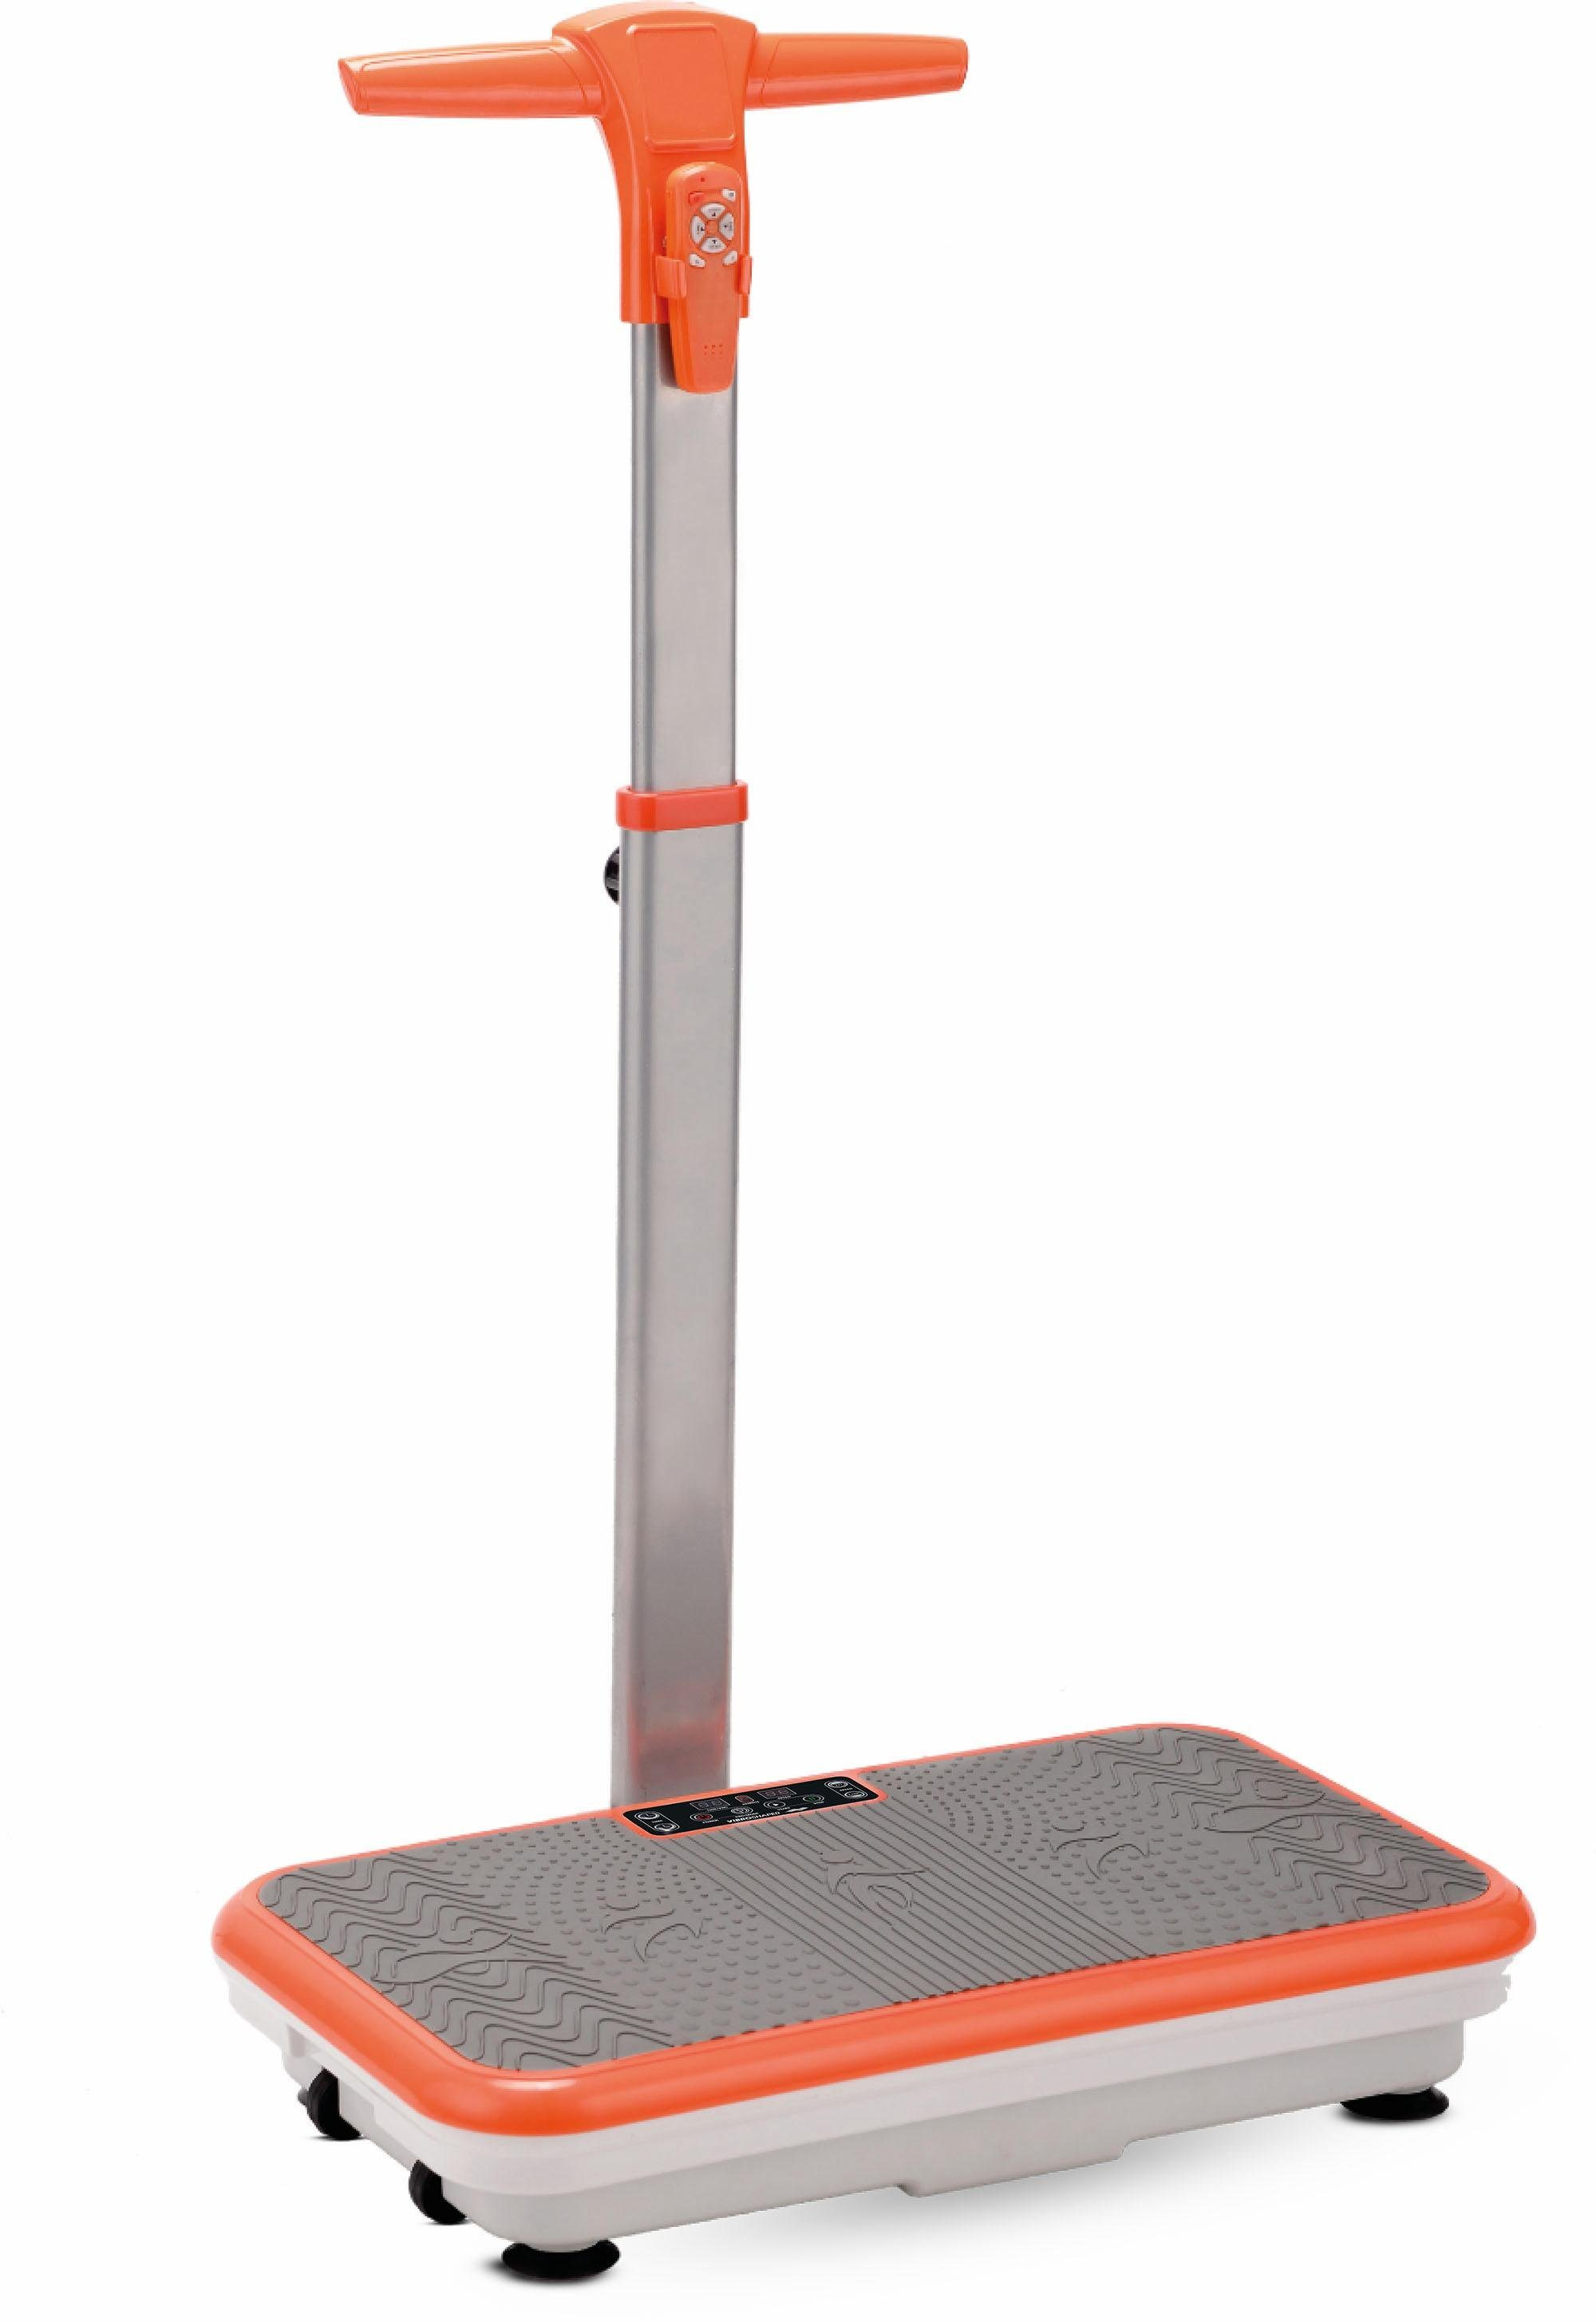 VibroShaper™ Vibrationsplatte, 200 W, 3 Intensitätsstufen, (Set, mit Trainingsbändern), mit Haltestange